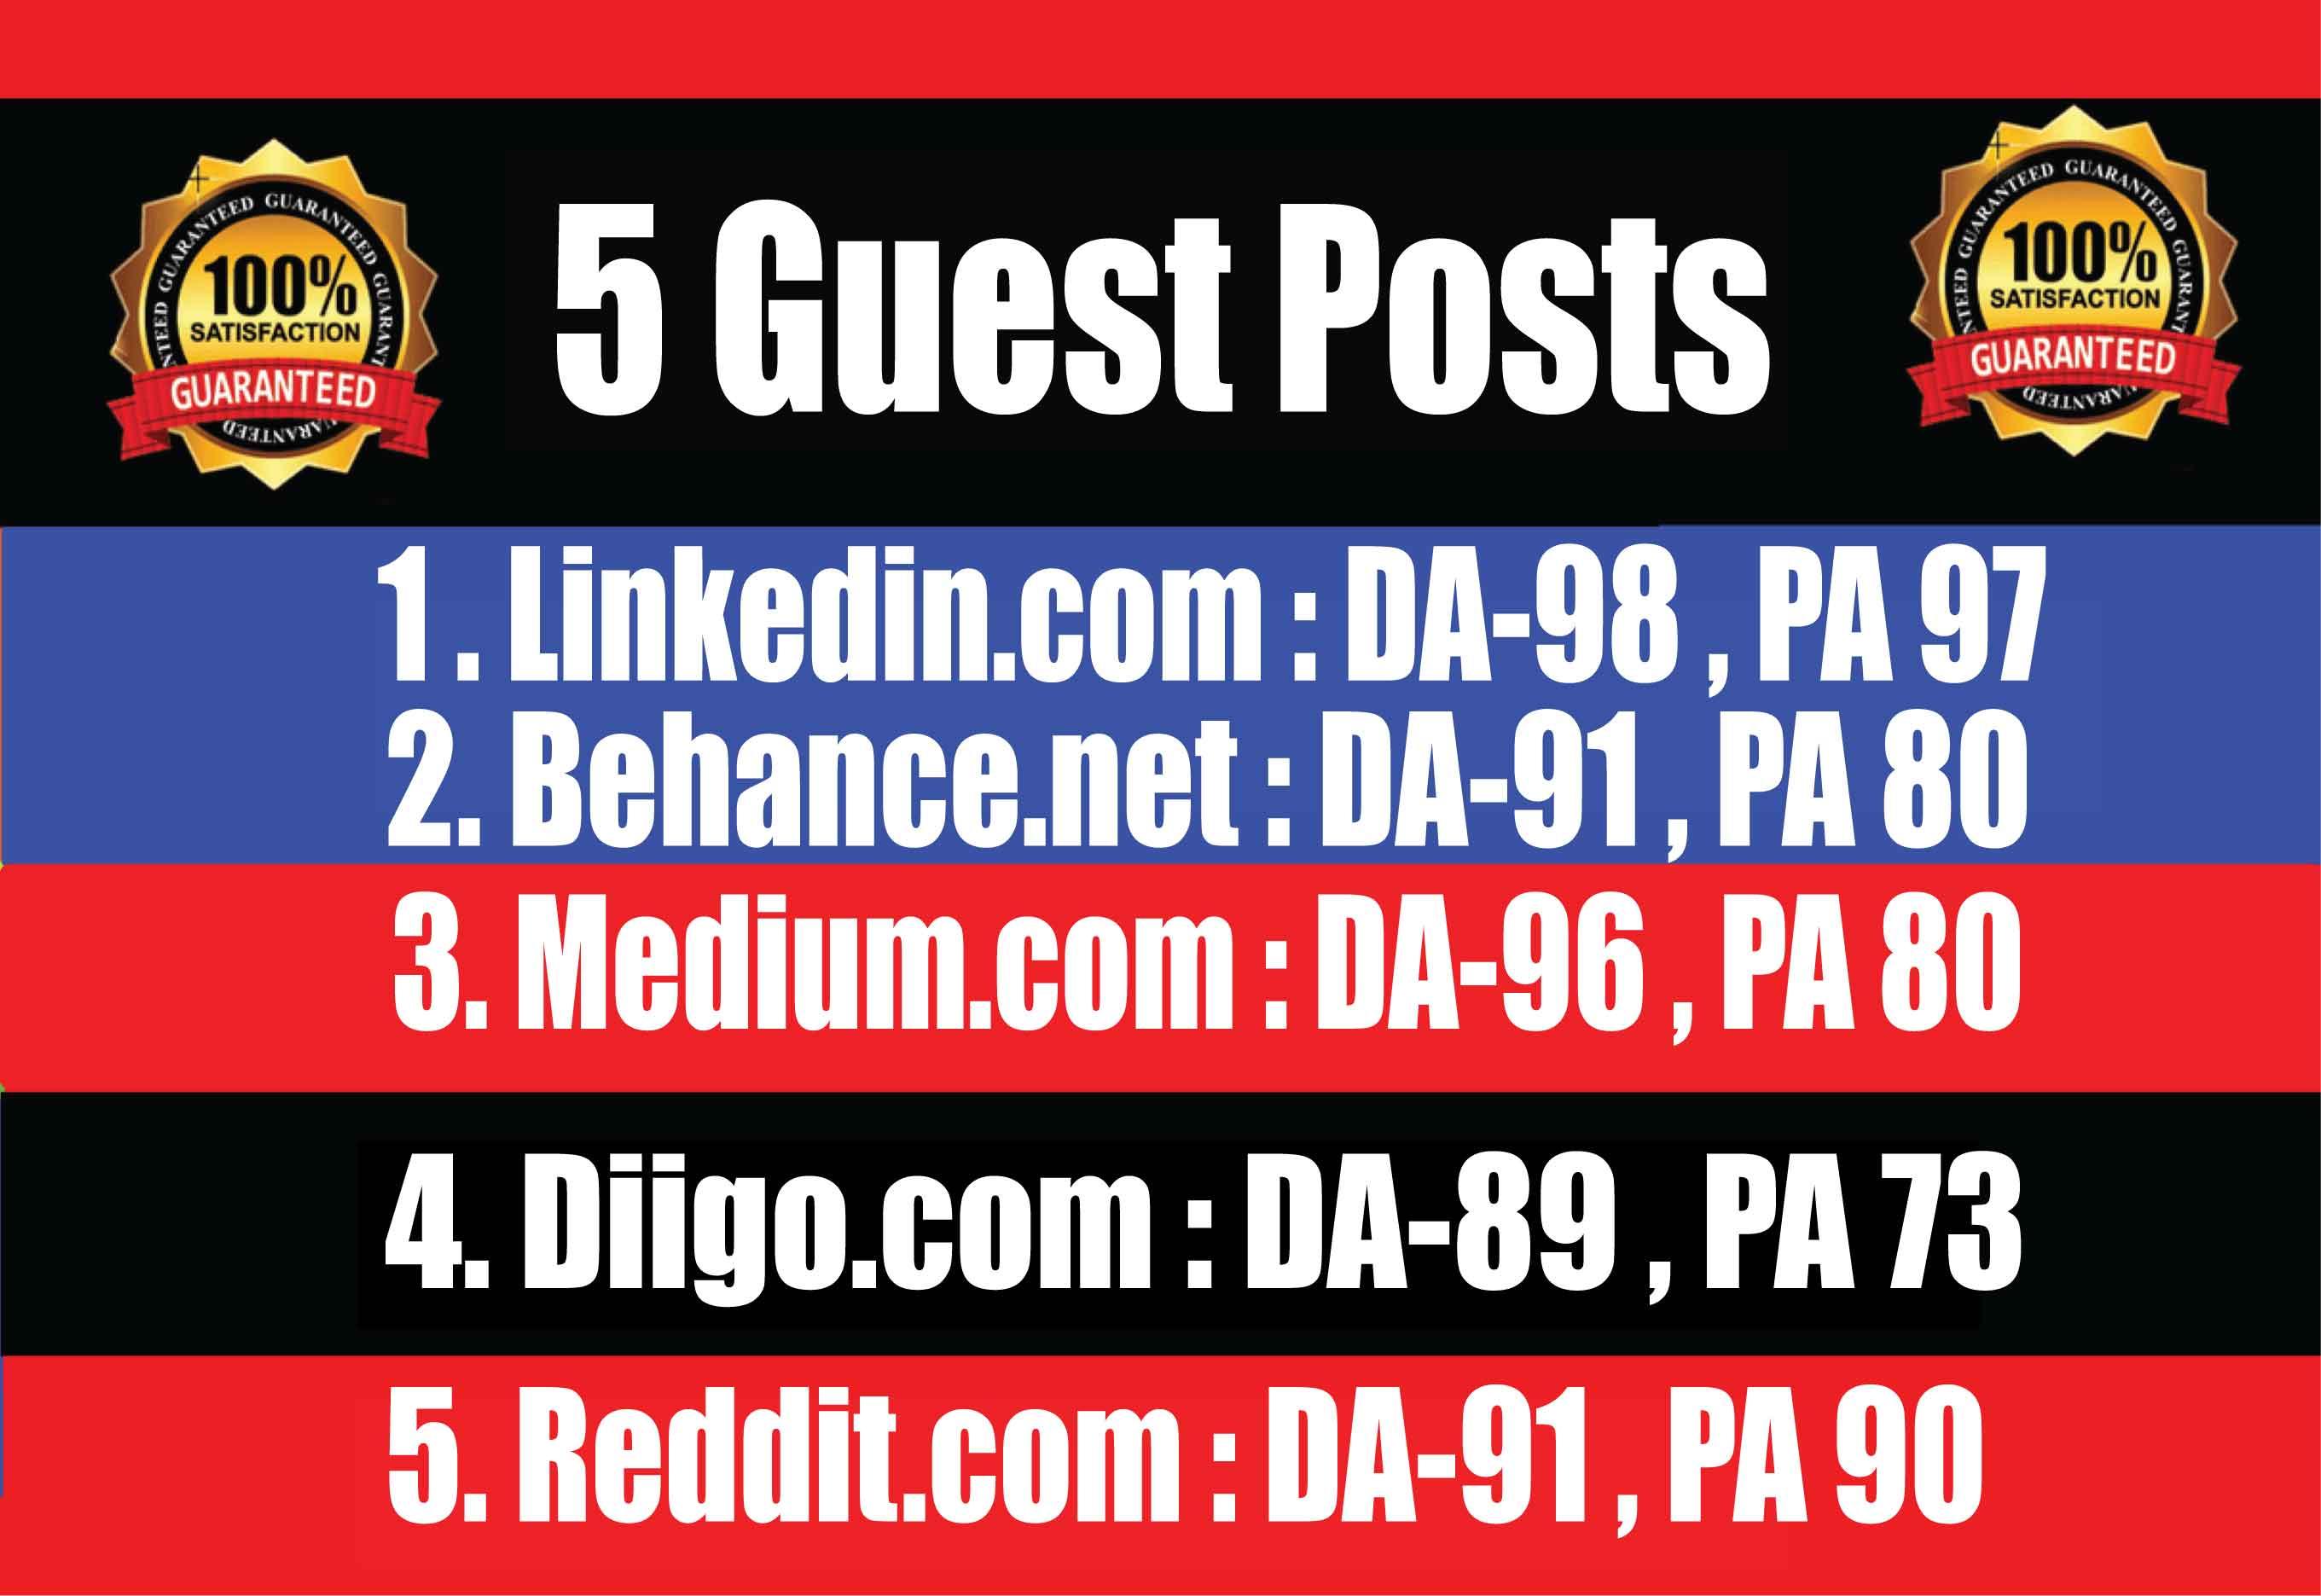 Publish 5 Guest Posts on Linkedin,  Behance,  Medium,  Diigo, Reddit High DA-90+ PA Blogs